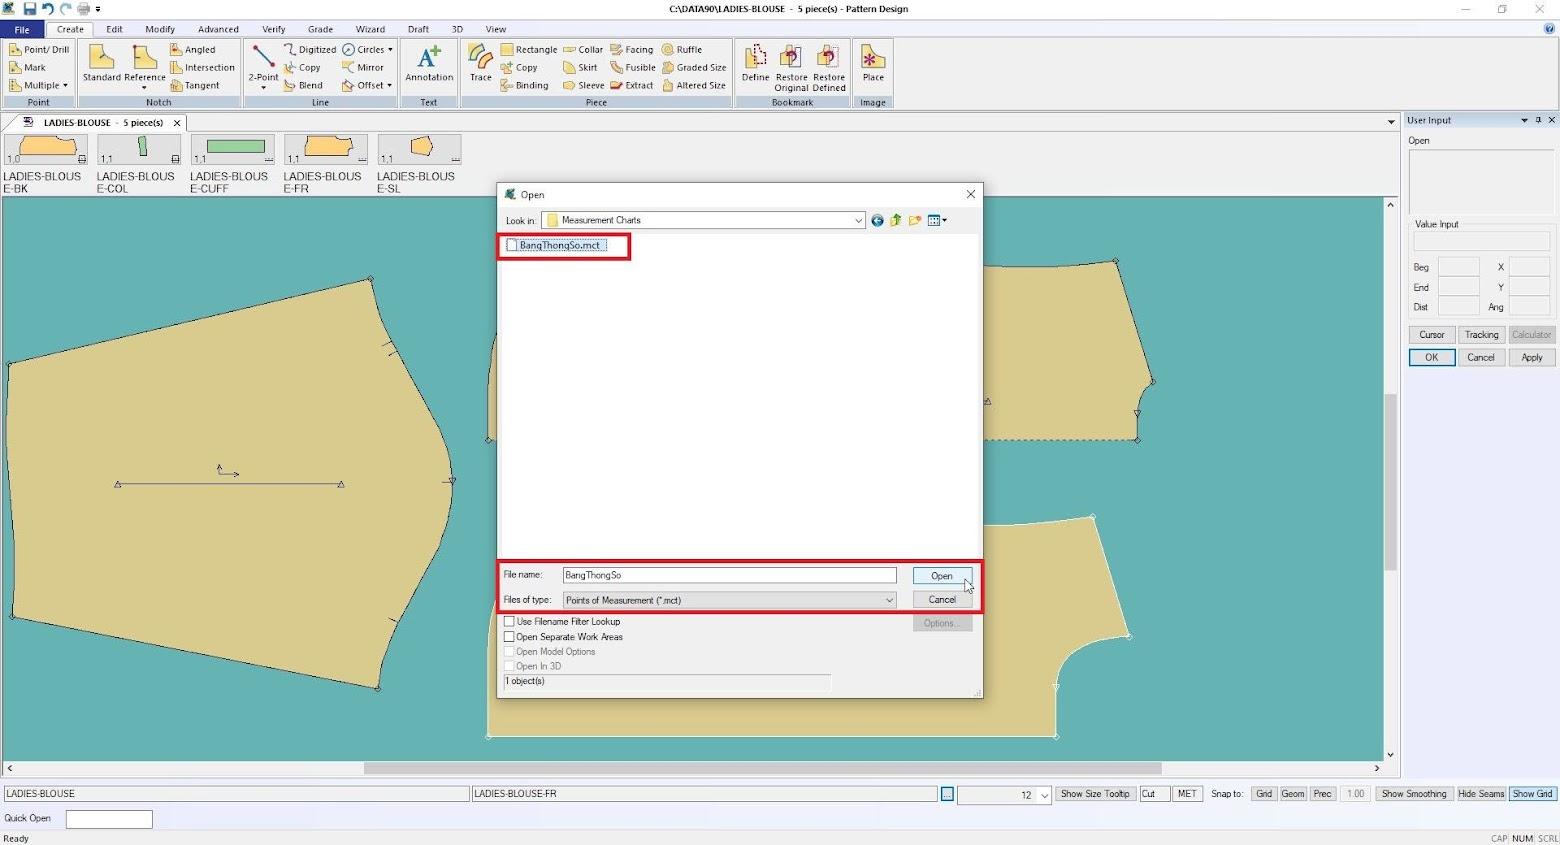 Gerber Pattern Design Point of Measurement: Cách Tạo Bảng Đo Thông Số 5